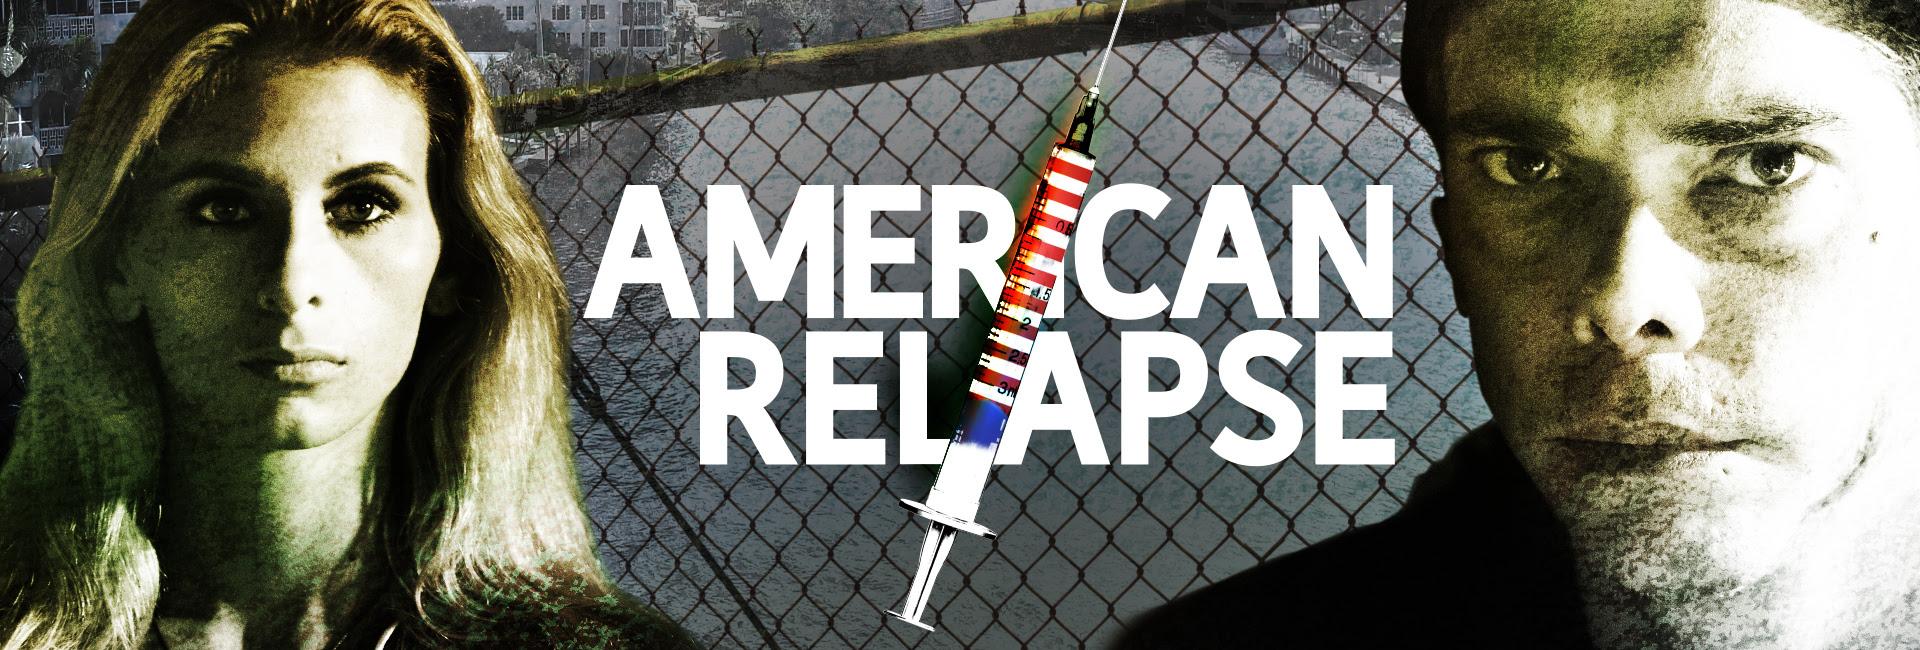 American Relapse.jpg